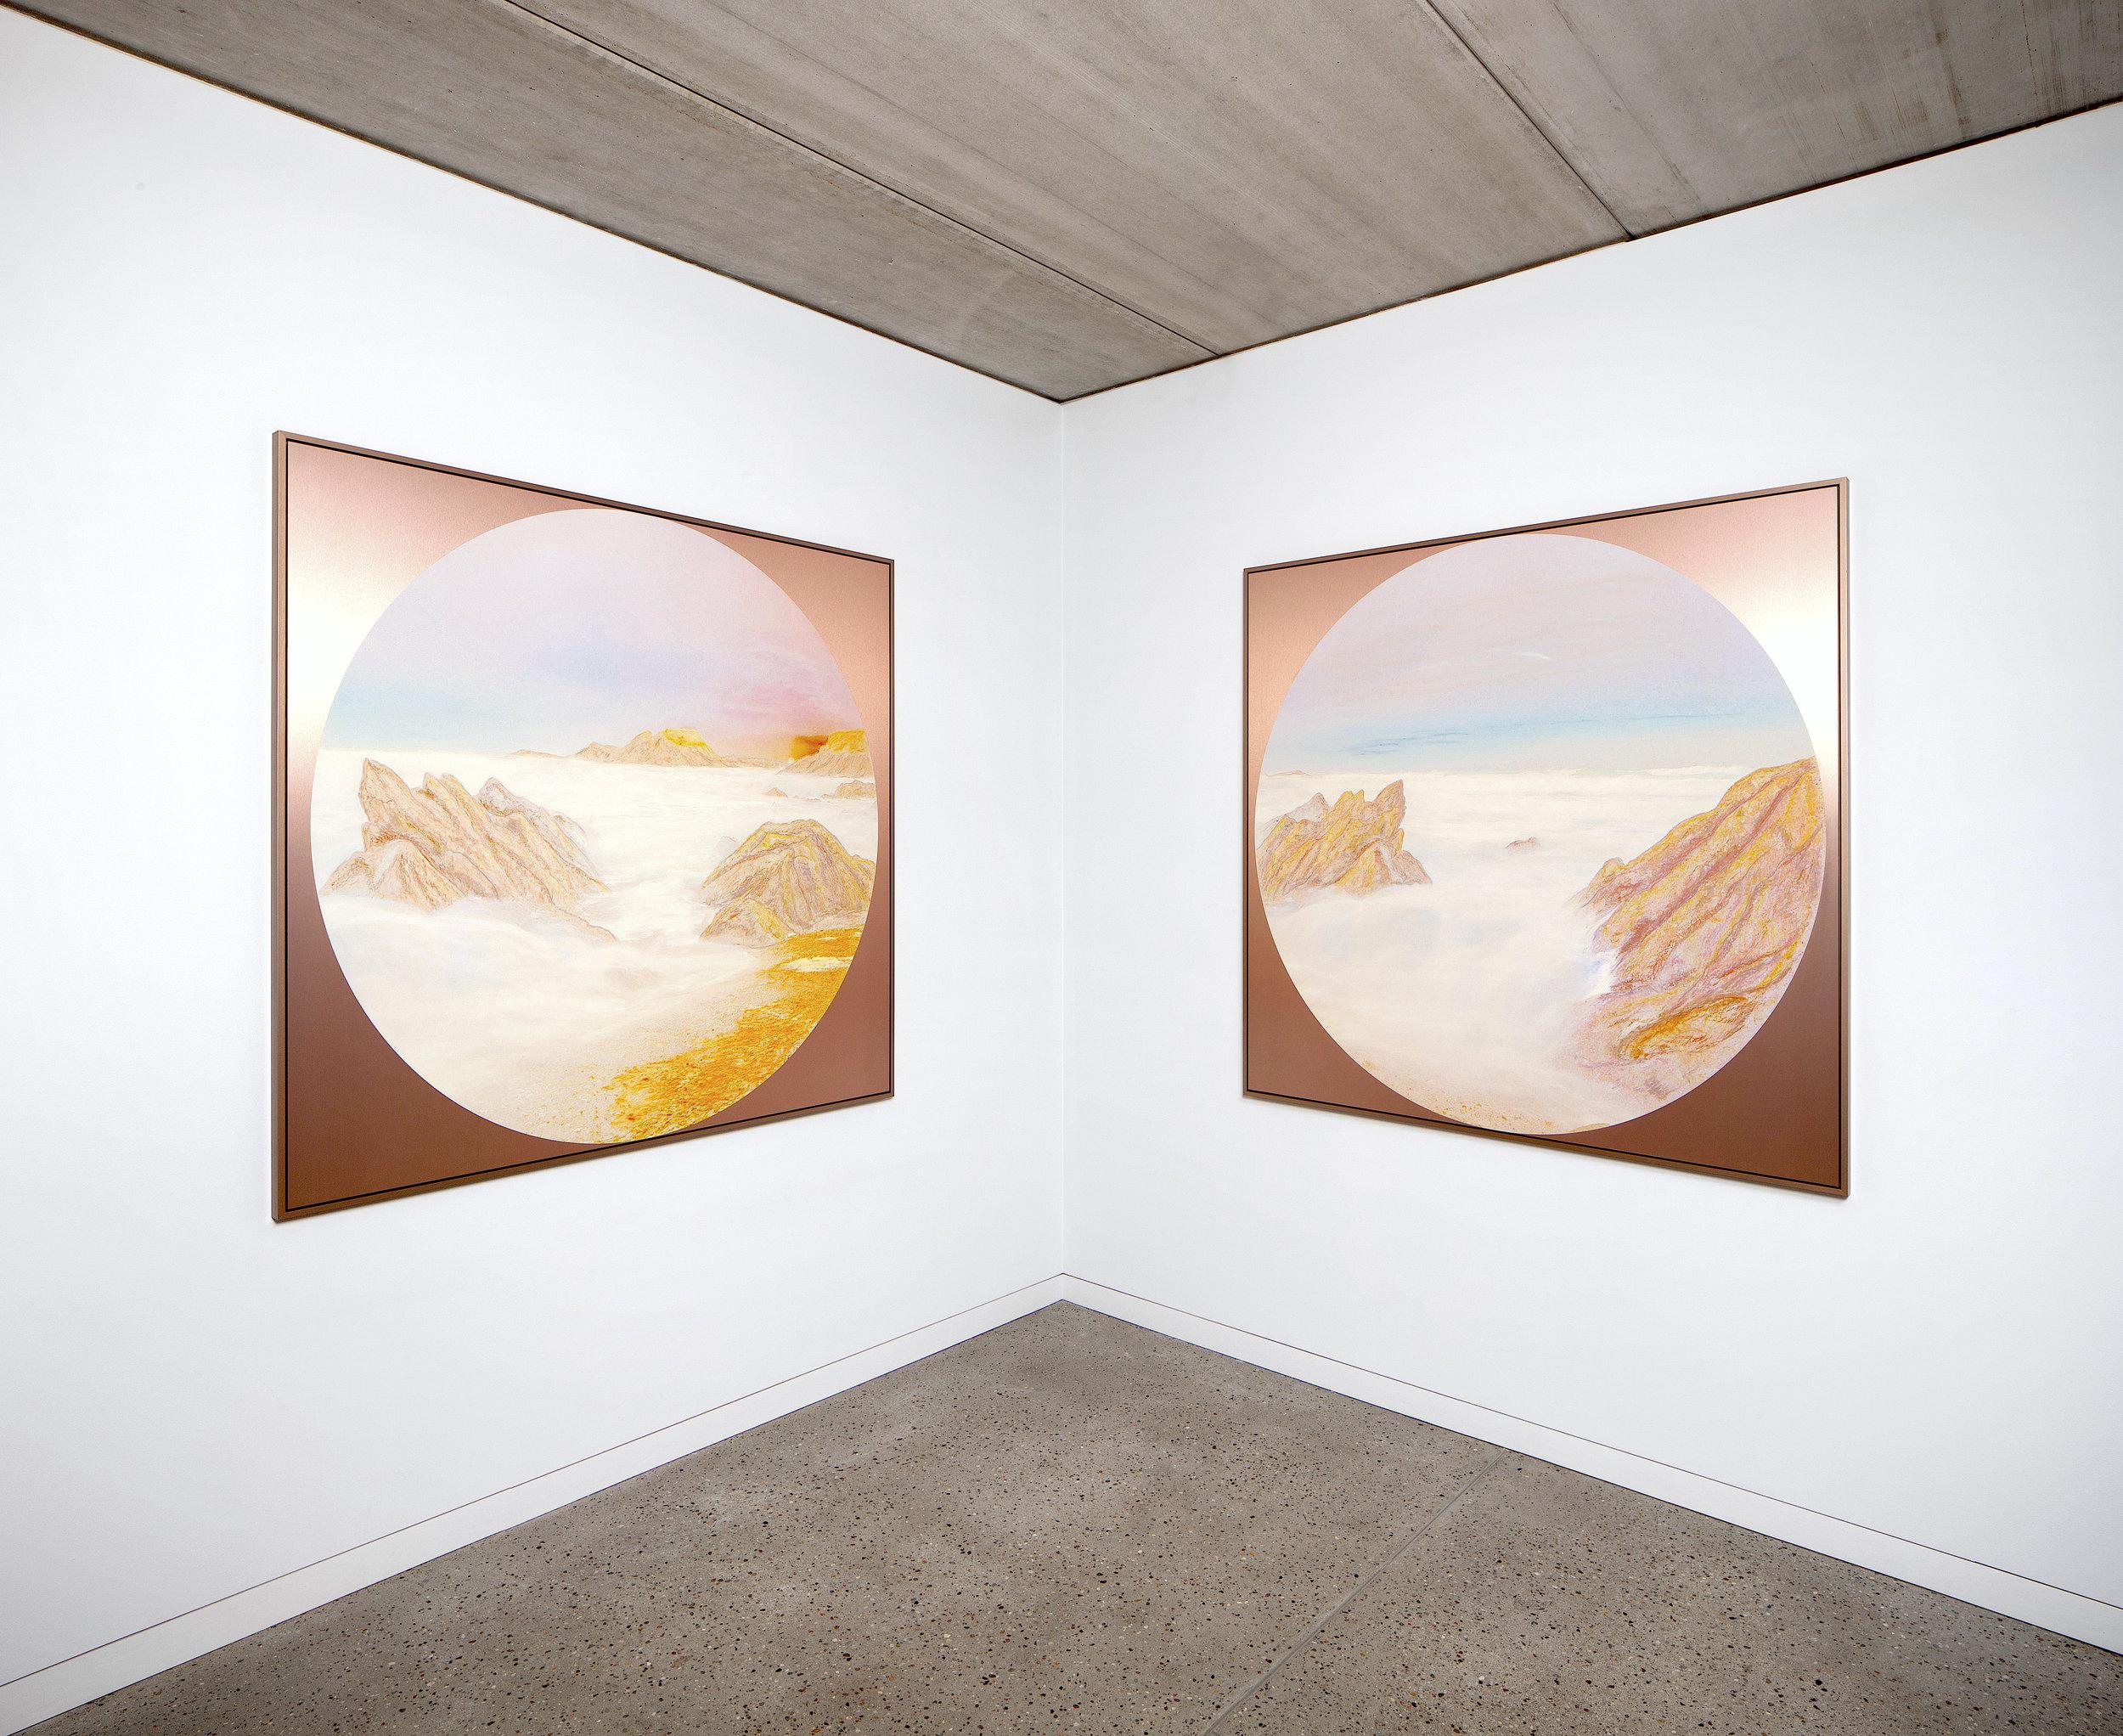 Beyond the Oecumene / Part XXXVIII, XXXIX,  2019 - Installation view Wax pastels, UV-print on copper Alu-dibond 150 x 150 cm (59 x 59 in) each